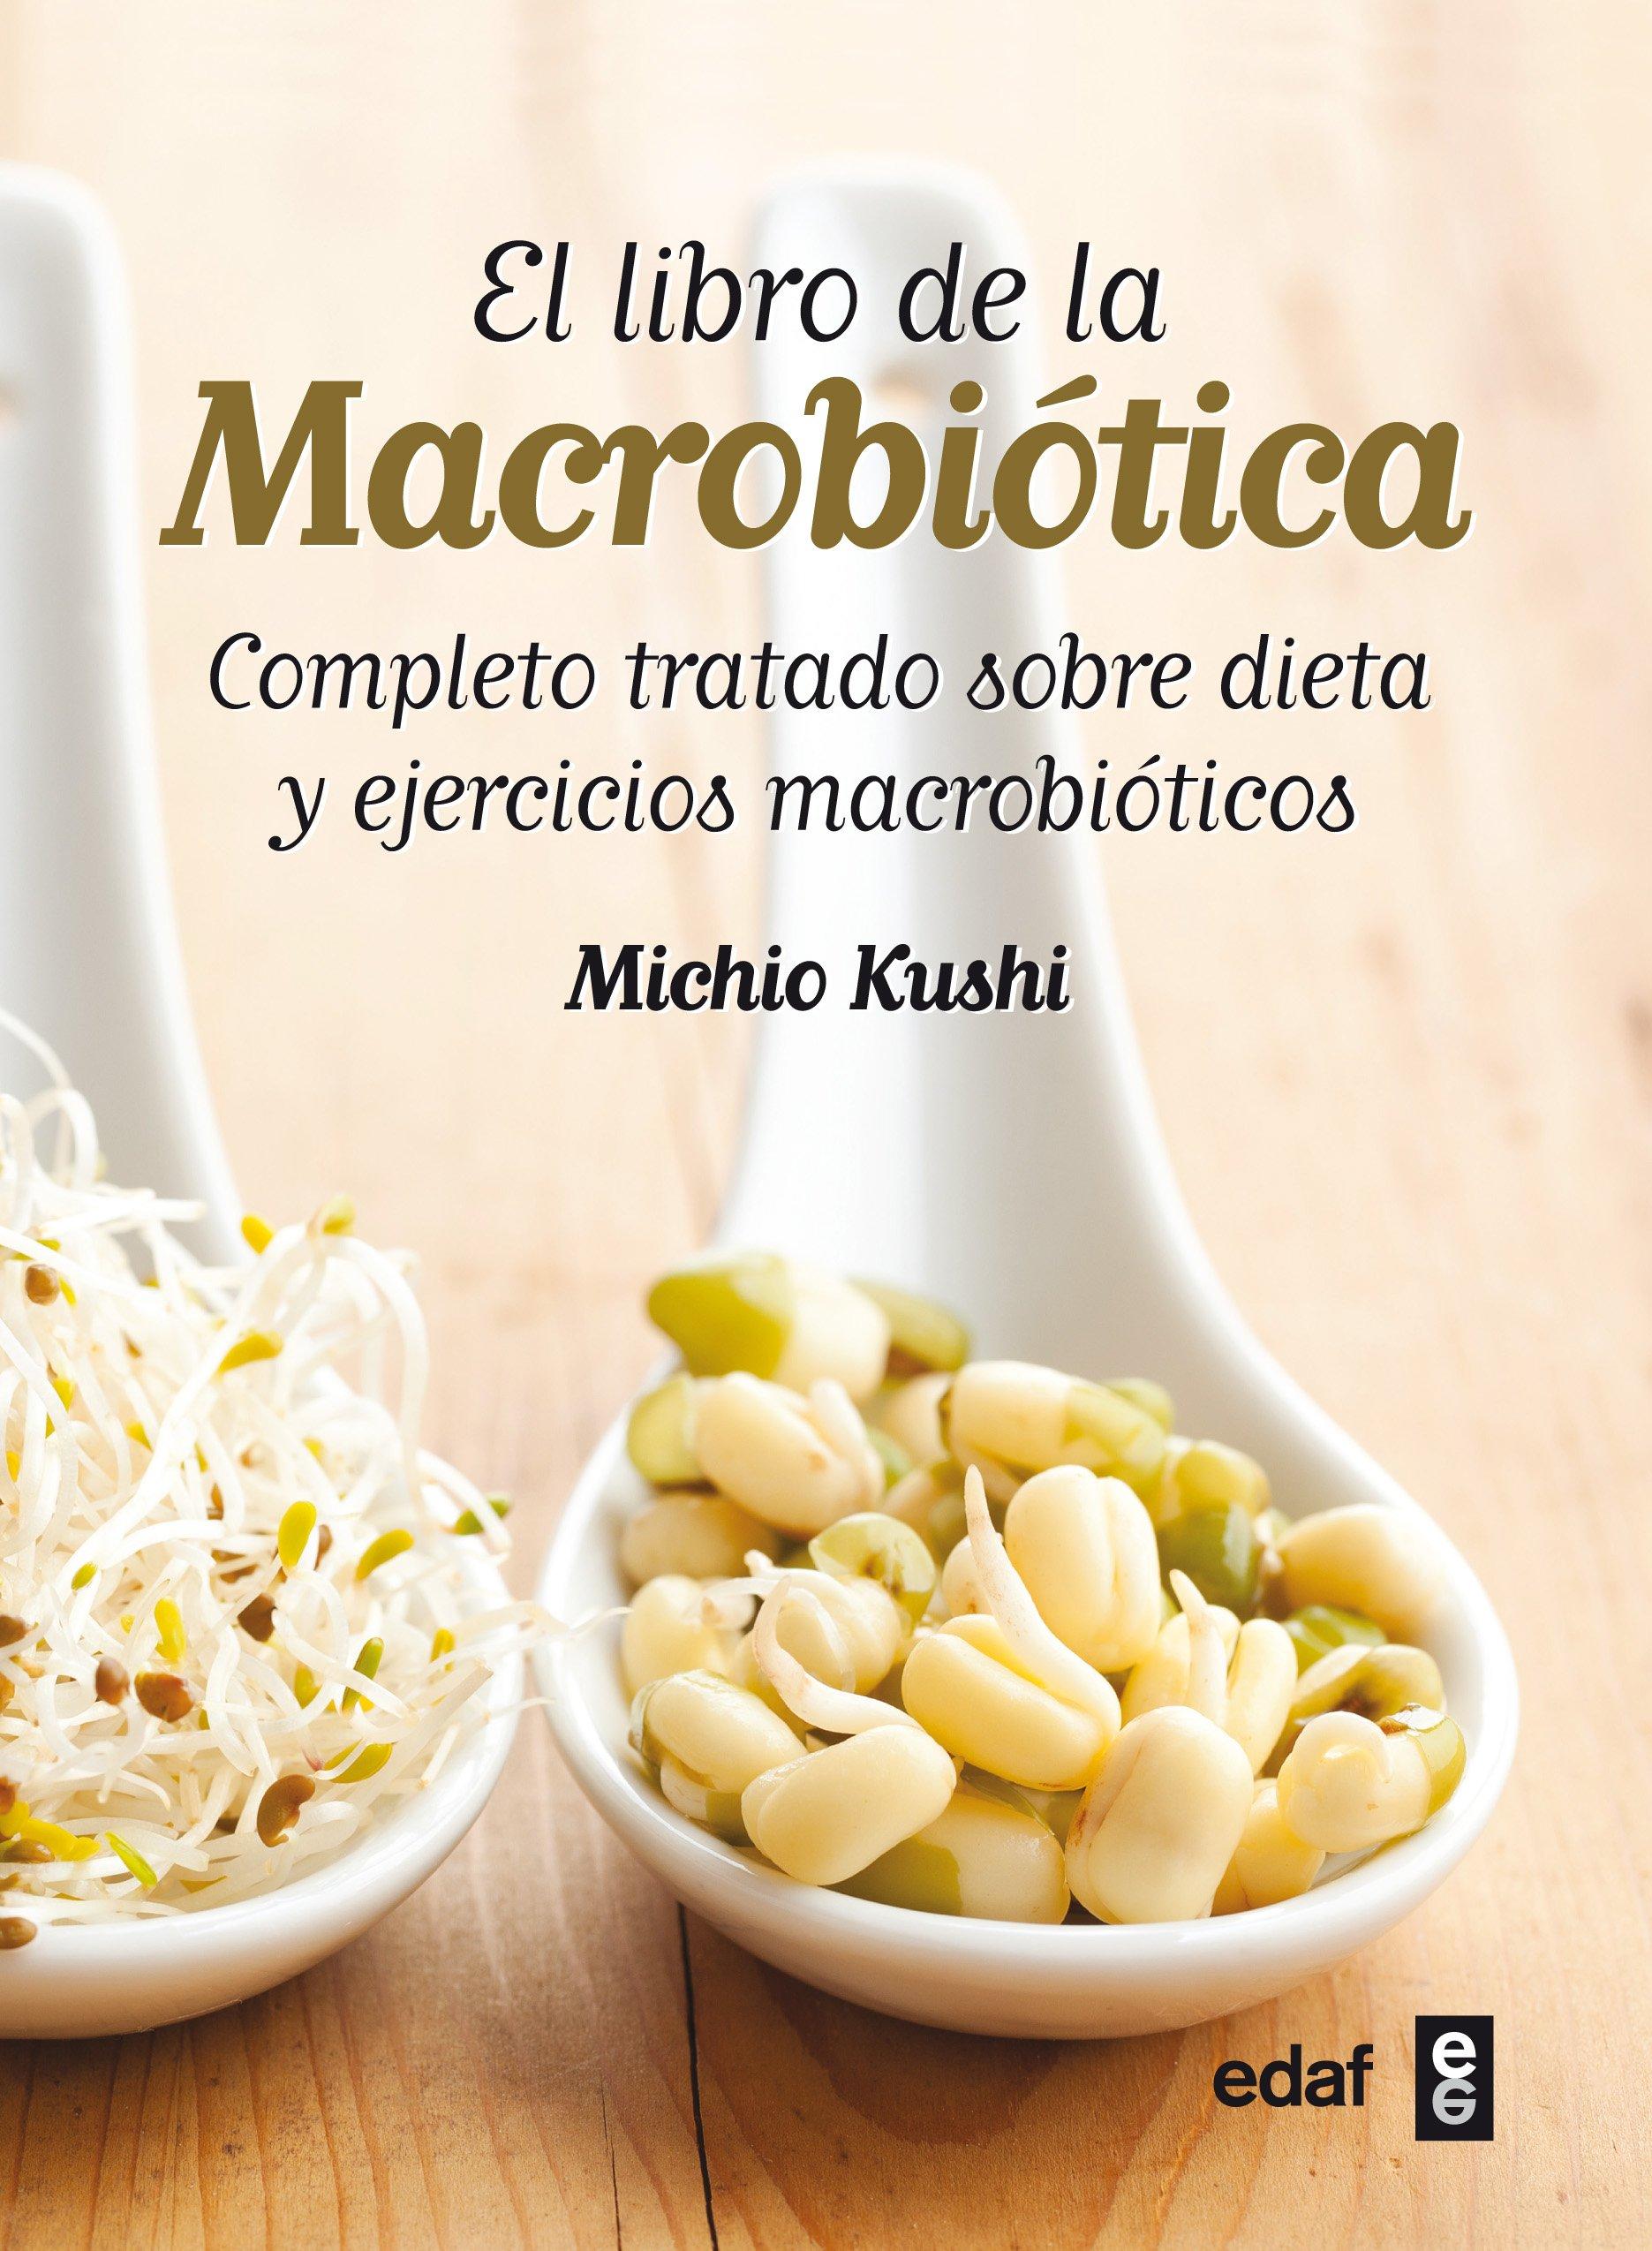 Dieta macrobiotica libro pdf